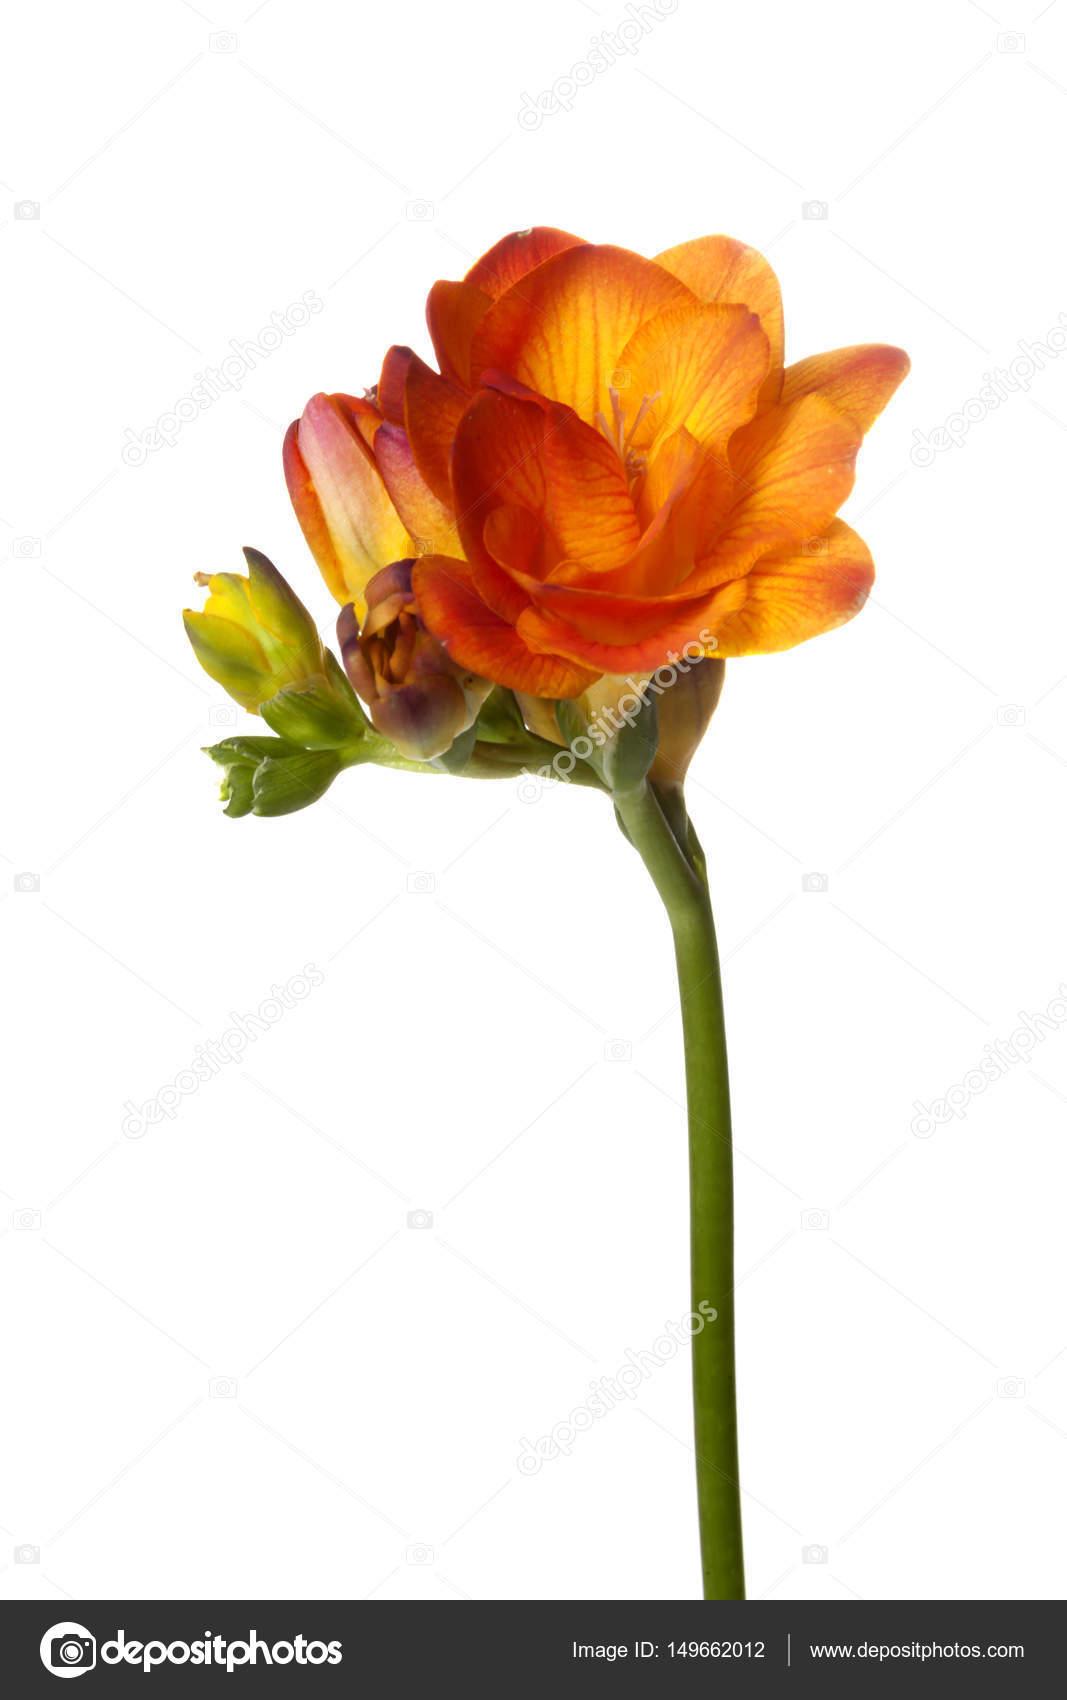 Orange freesia flower stock photo marlonnekewillemsen 149662012 orange freesia flower isolated on white background photo by marlonnekewillemsen mightylinksfo